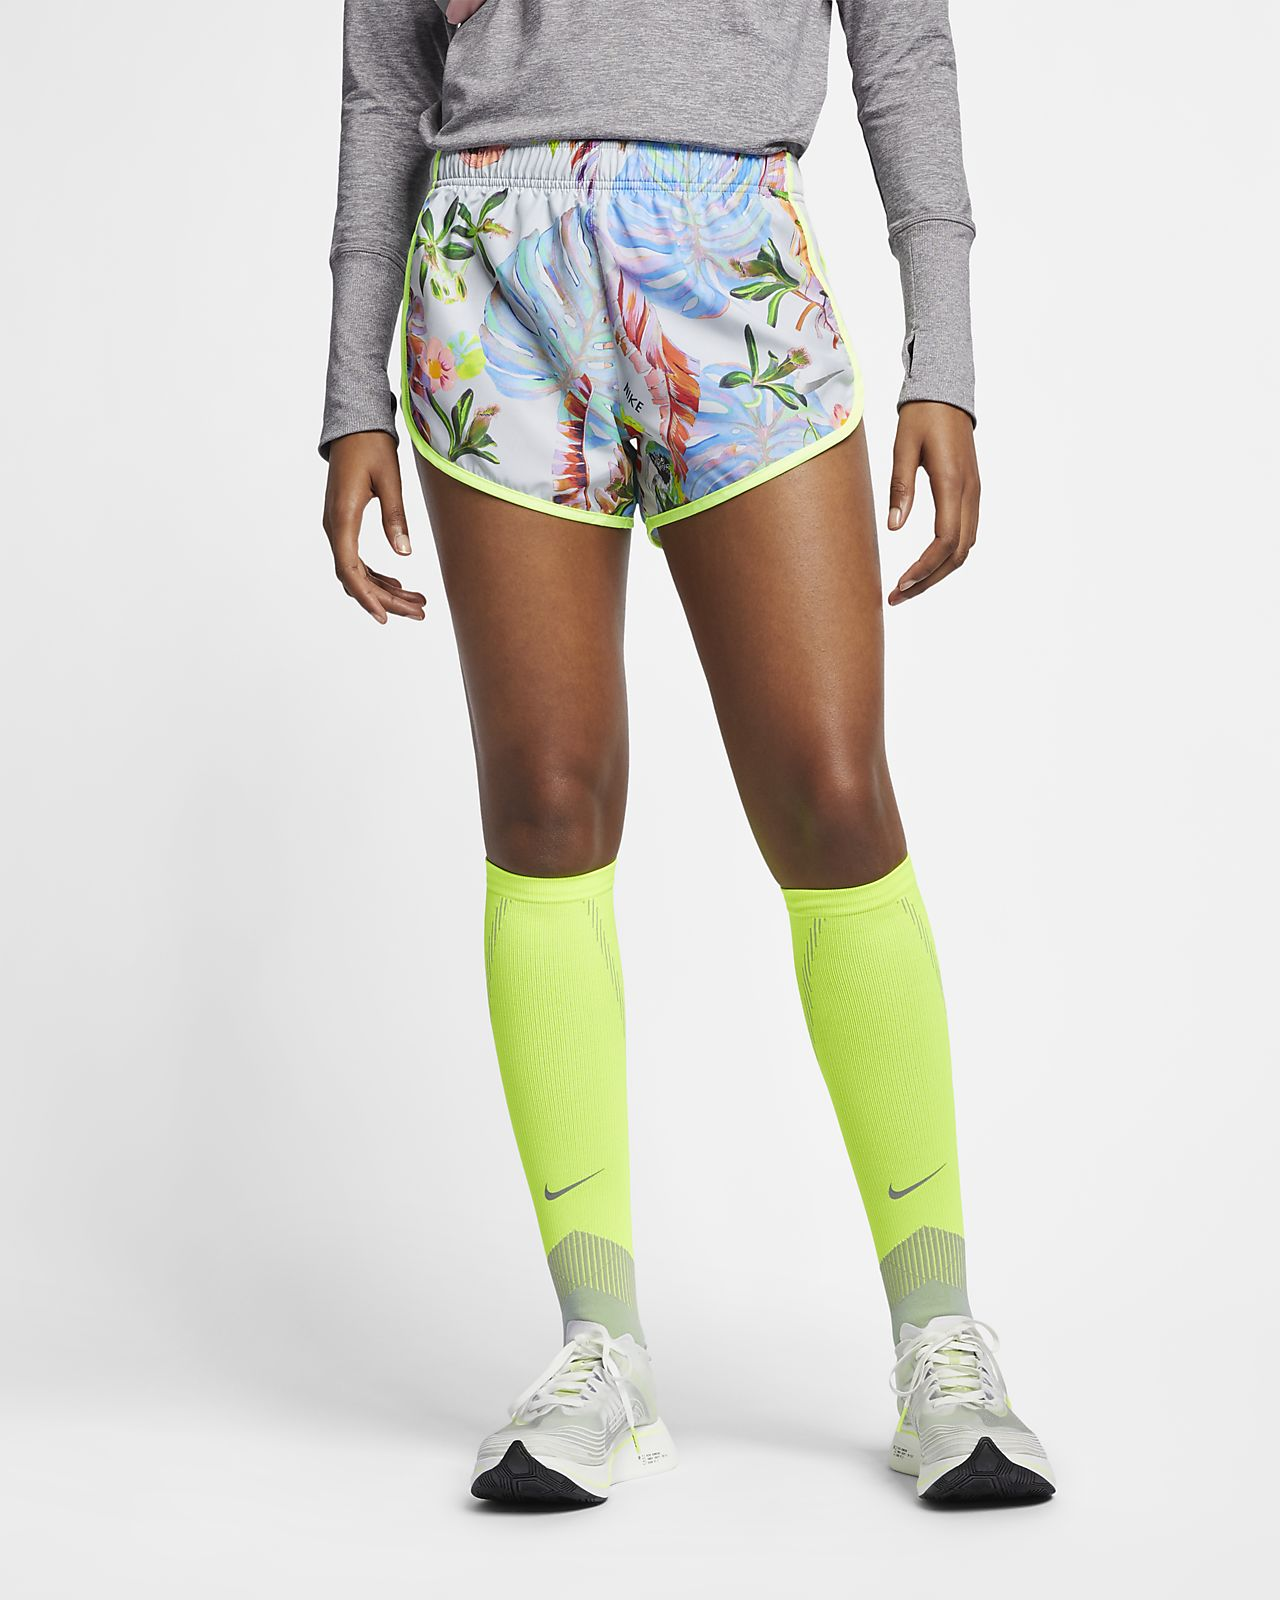 db288dfcbaa2b Nike Tempo Women s Printed Running Shorts. Nike.com BG